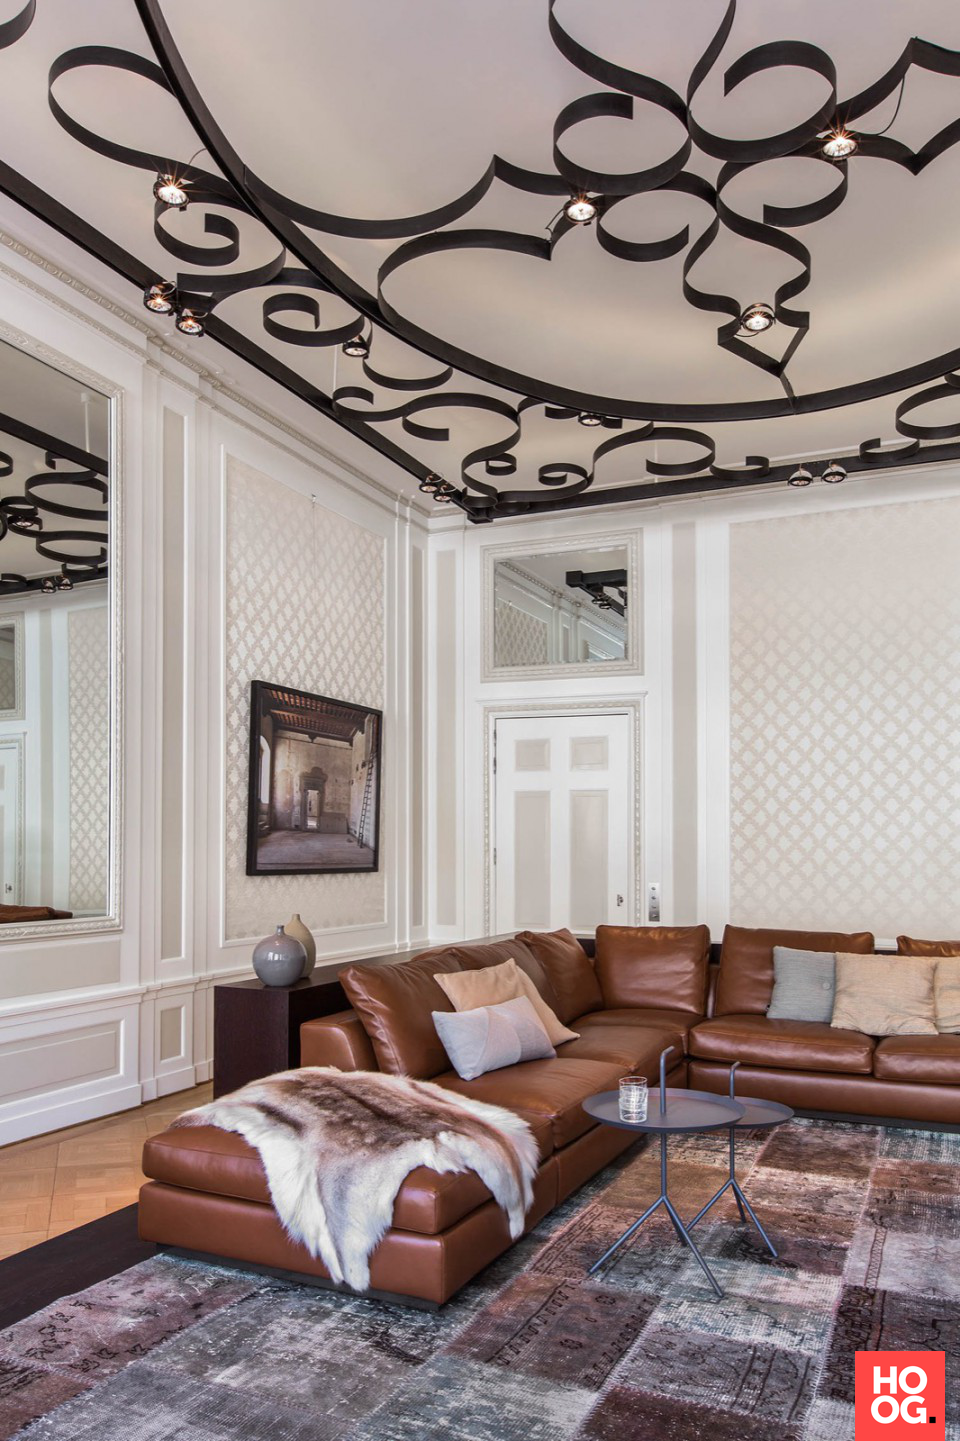 design woonkamer met luxe meubels interieur ideen woonkamer living room hoog